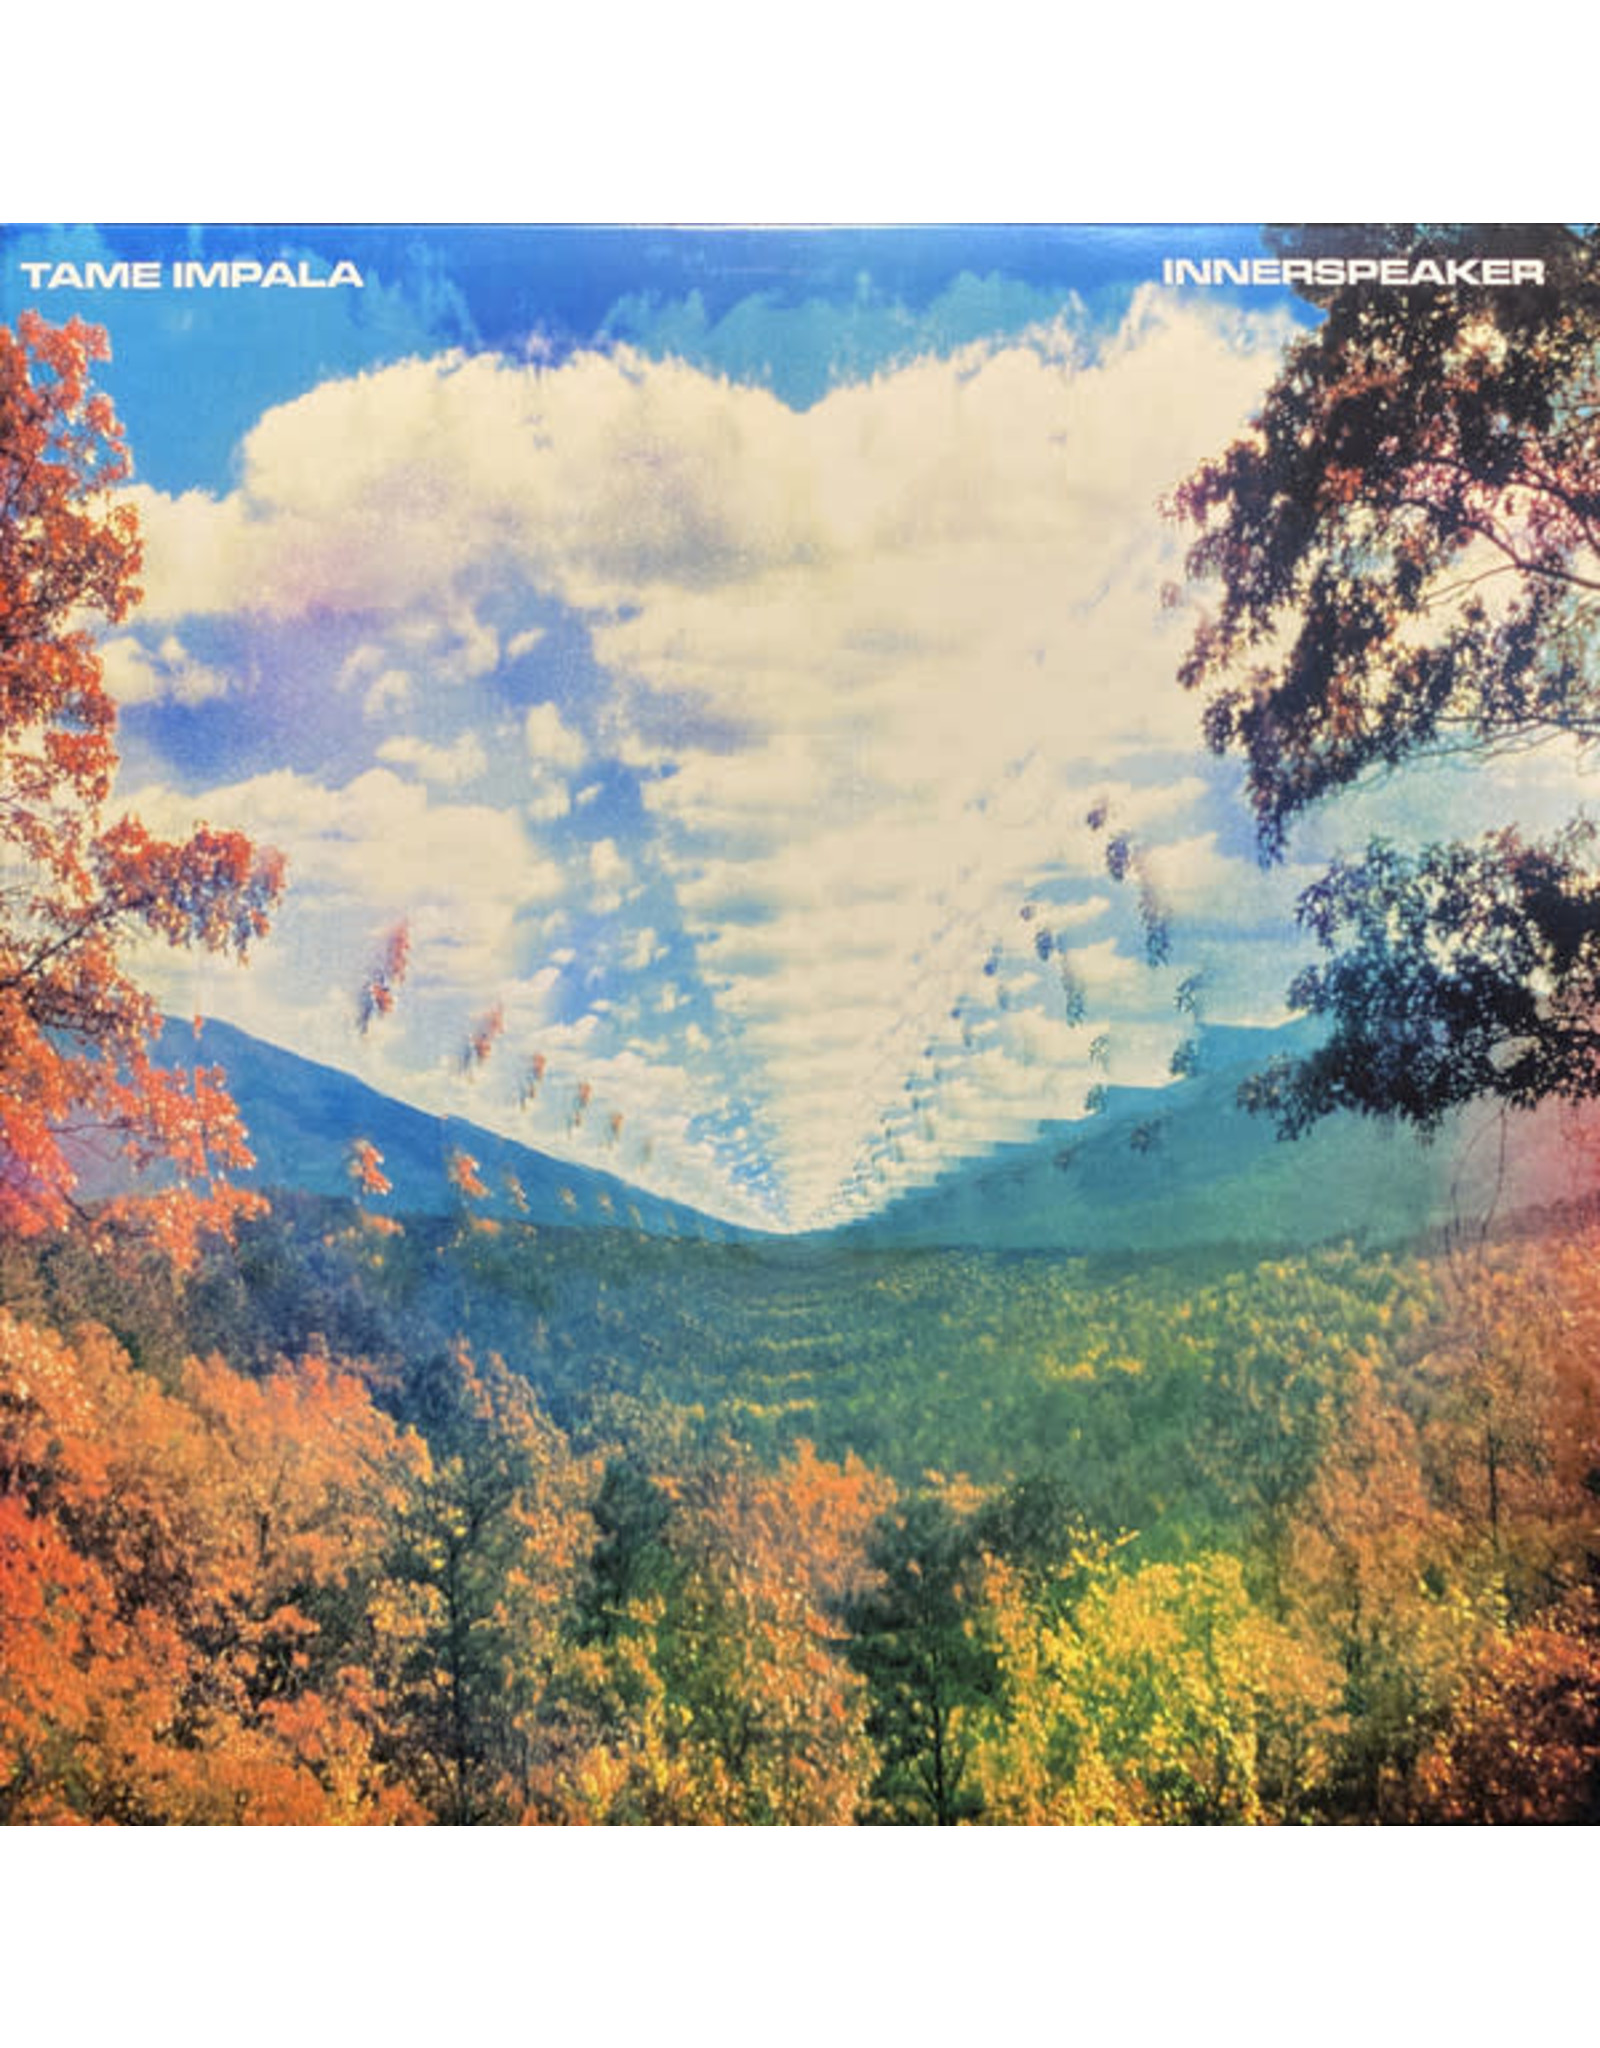 Tame Impala - Innerspeaker LP